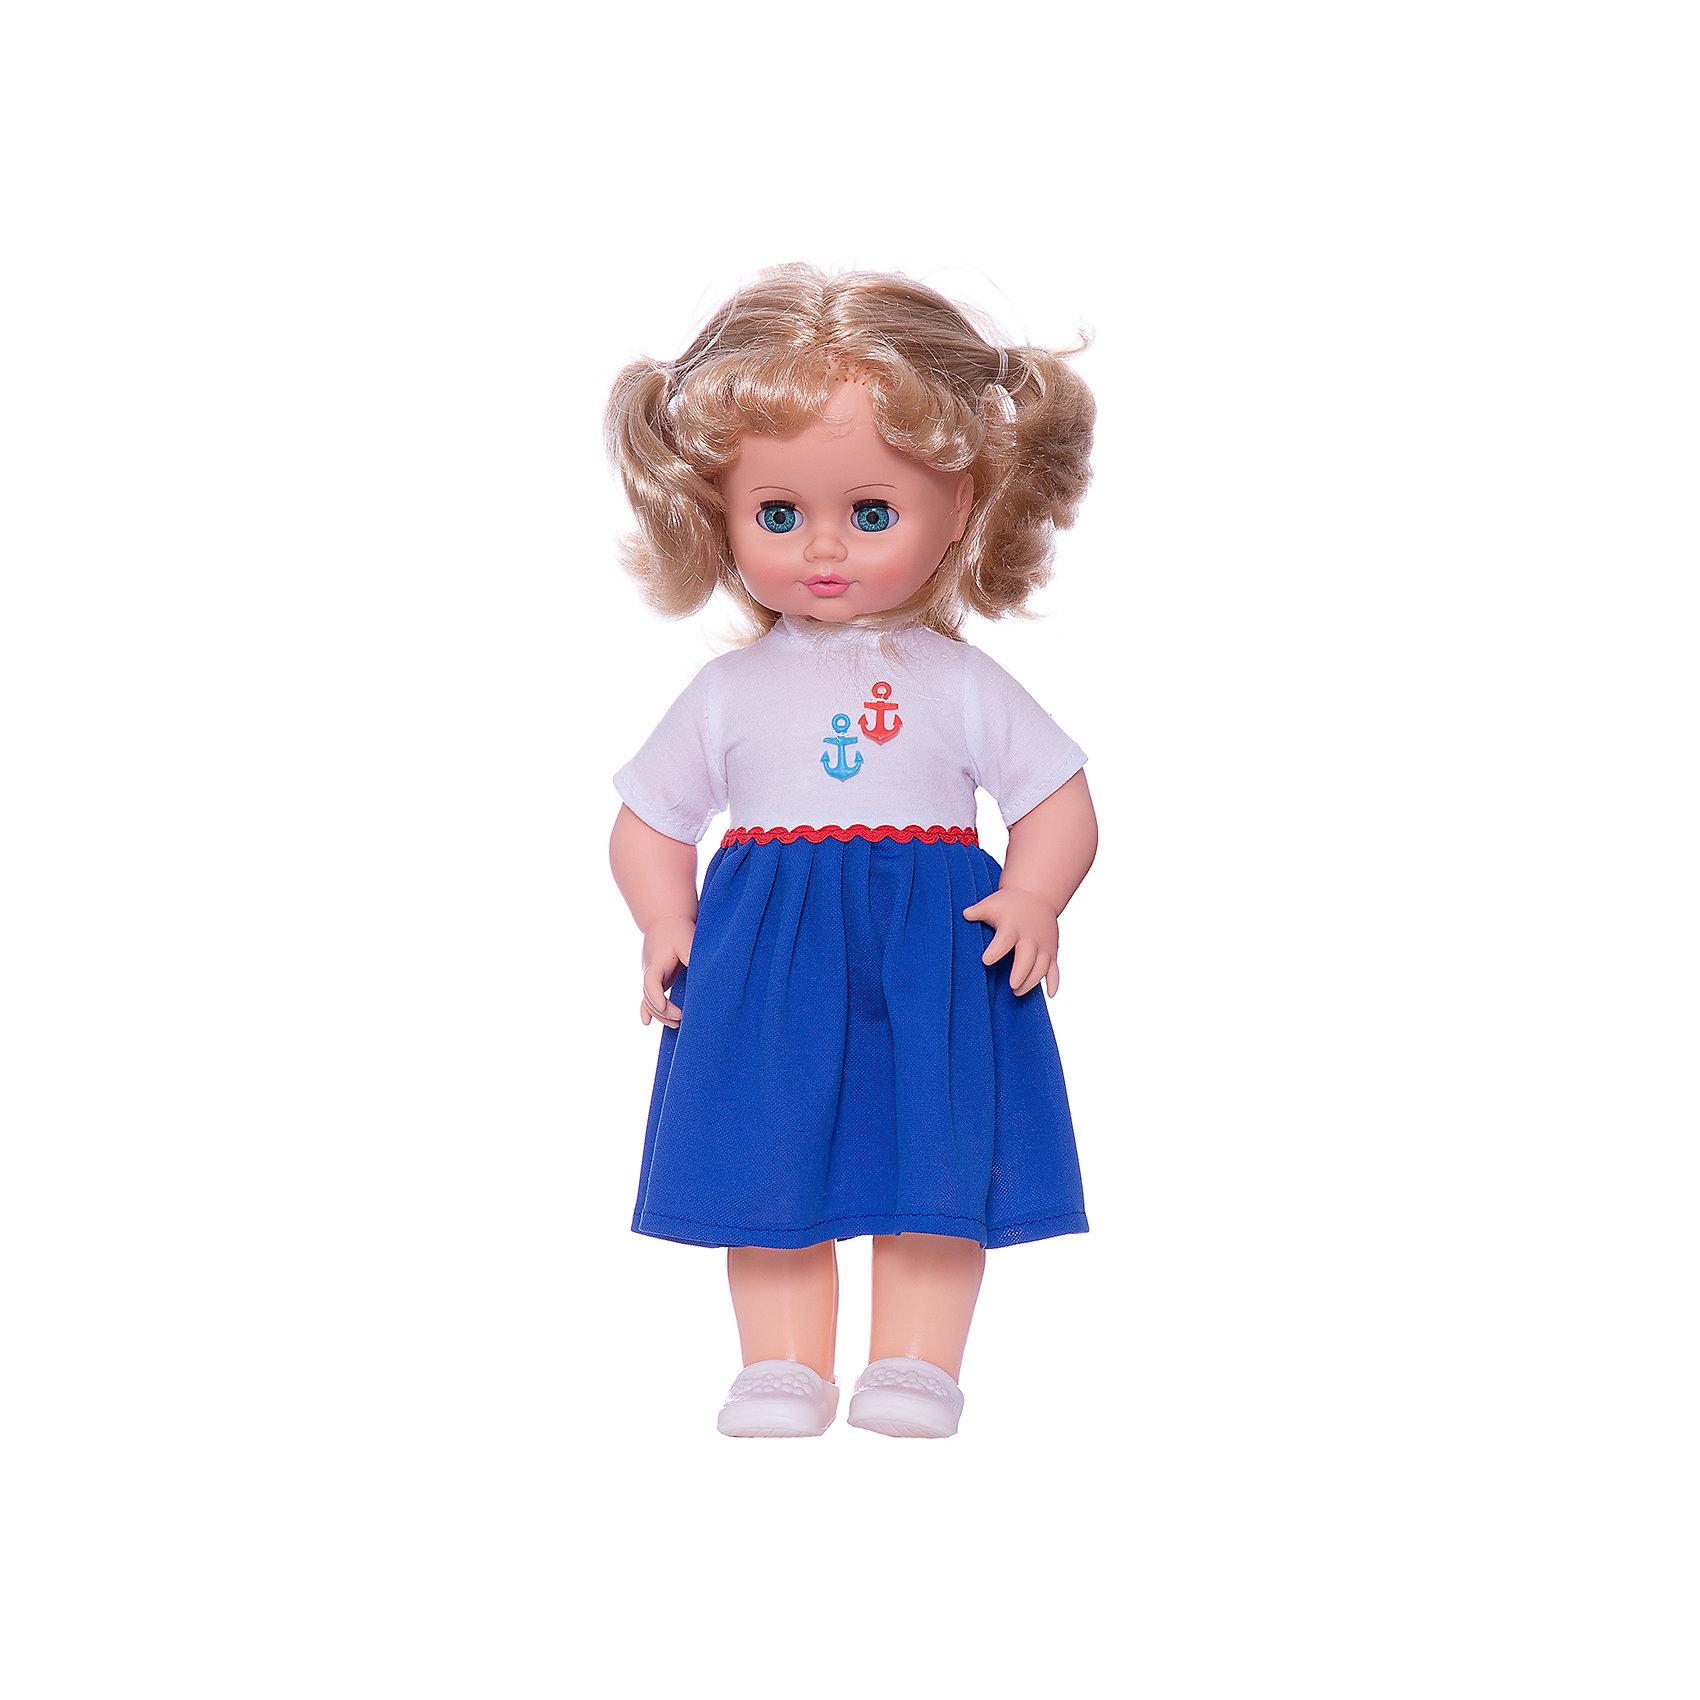 Весна Кукла Инна 28, со звуком, Весна кукла весна алсу 35 см со звуком в1634 о